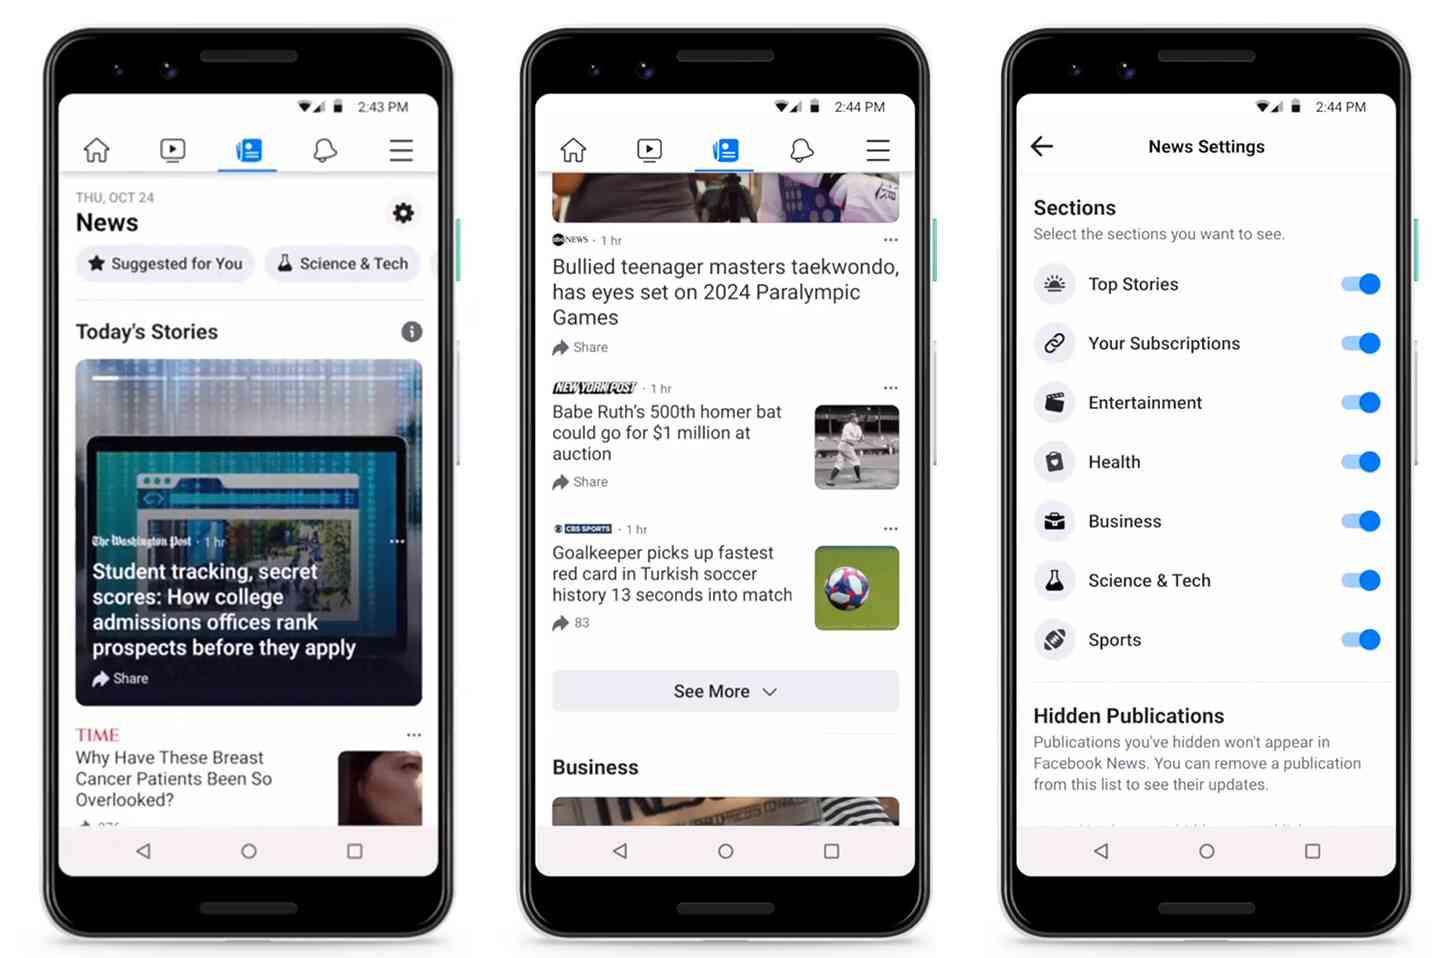 Facebook News app tab